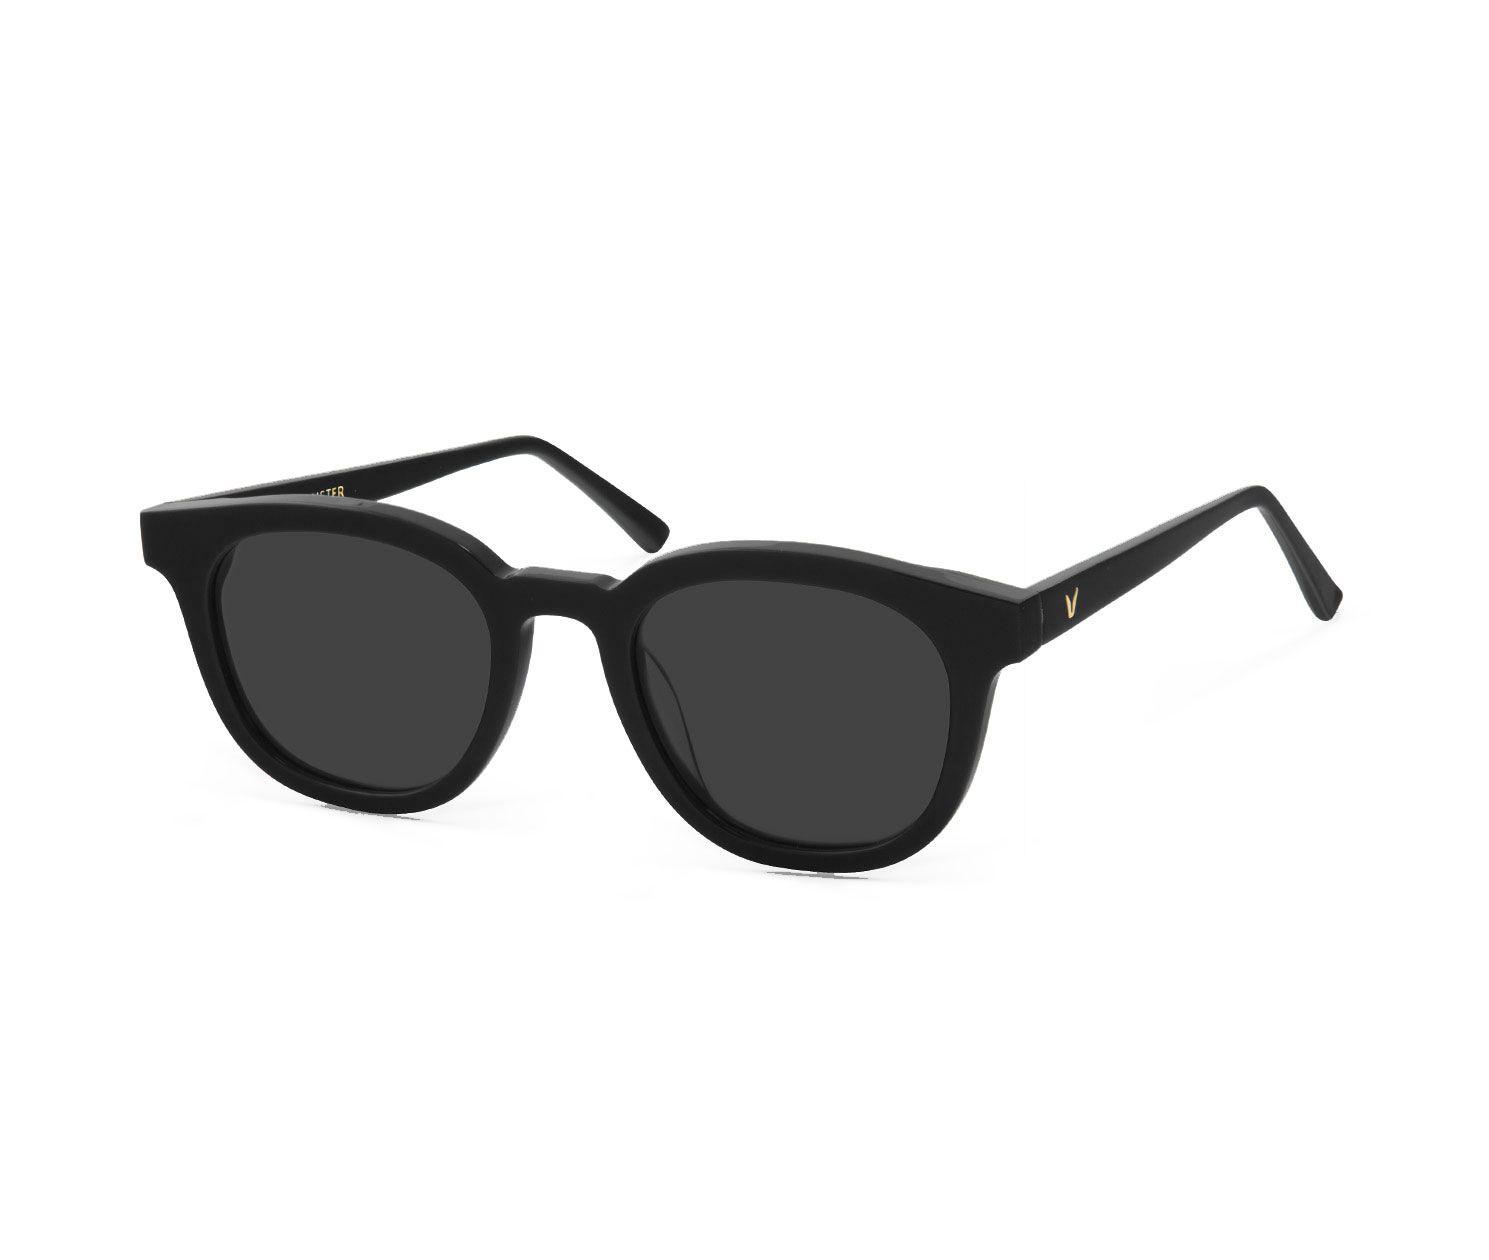 8a11a58d90 GENTLE MONSTER - KEY WEST 01 | shades/eyewears in 2019 | Sunglasses ...